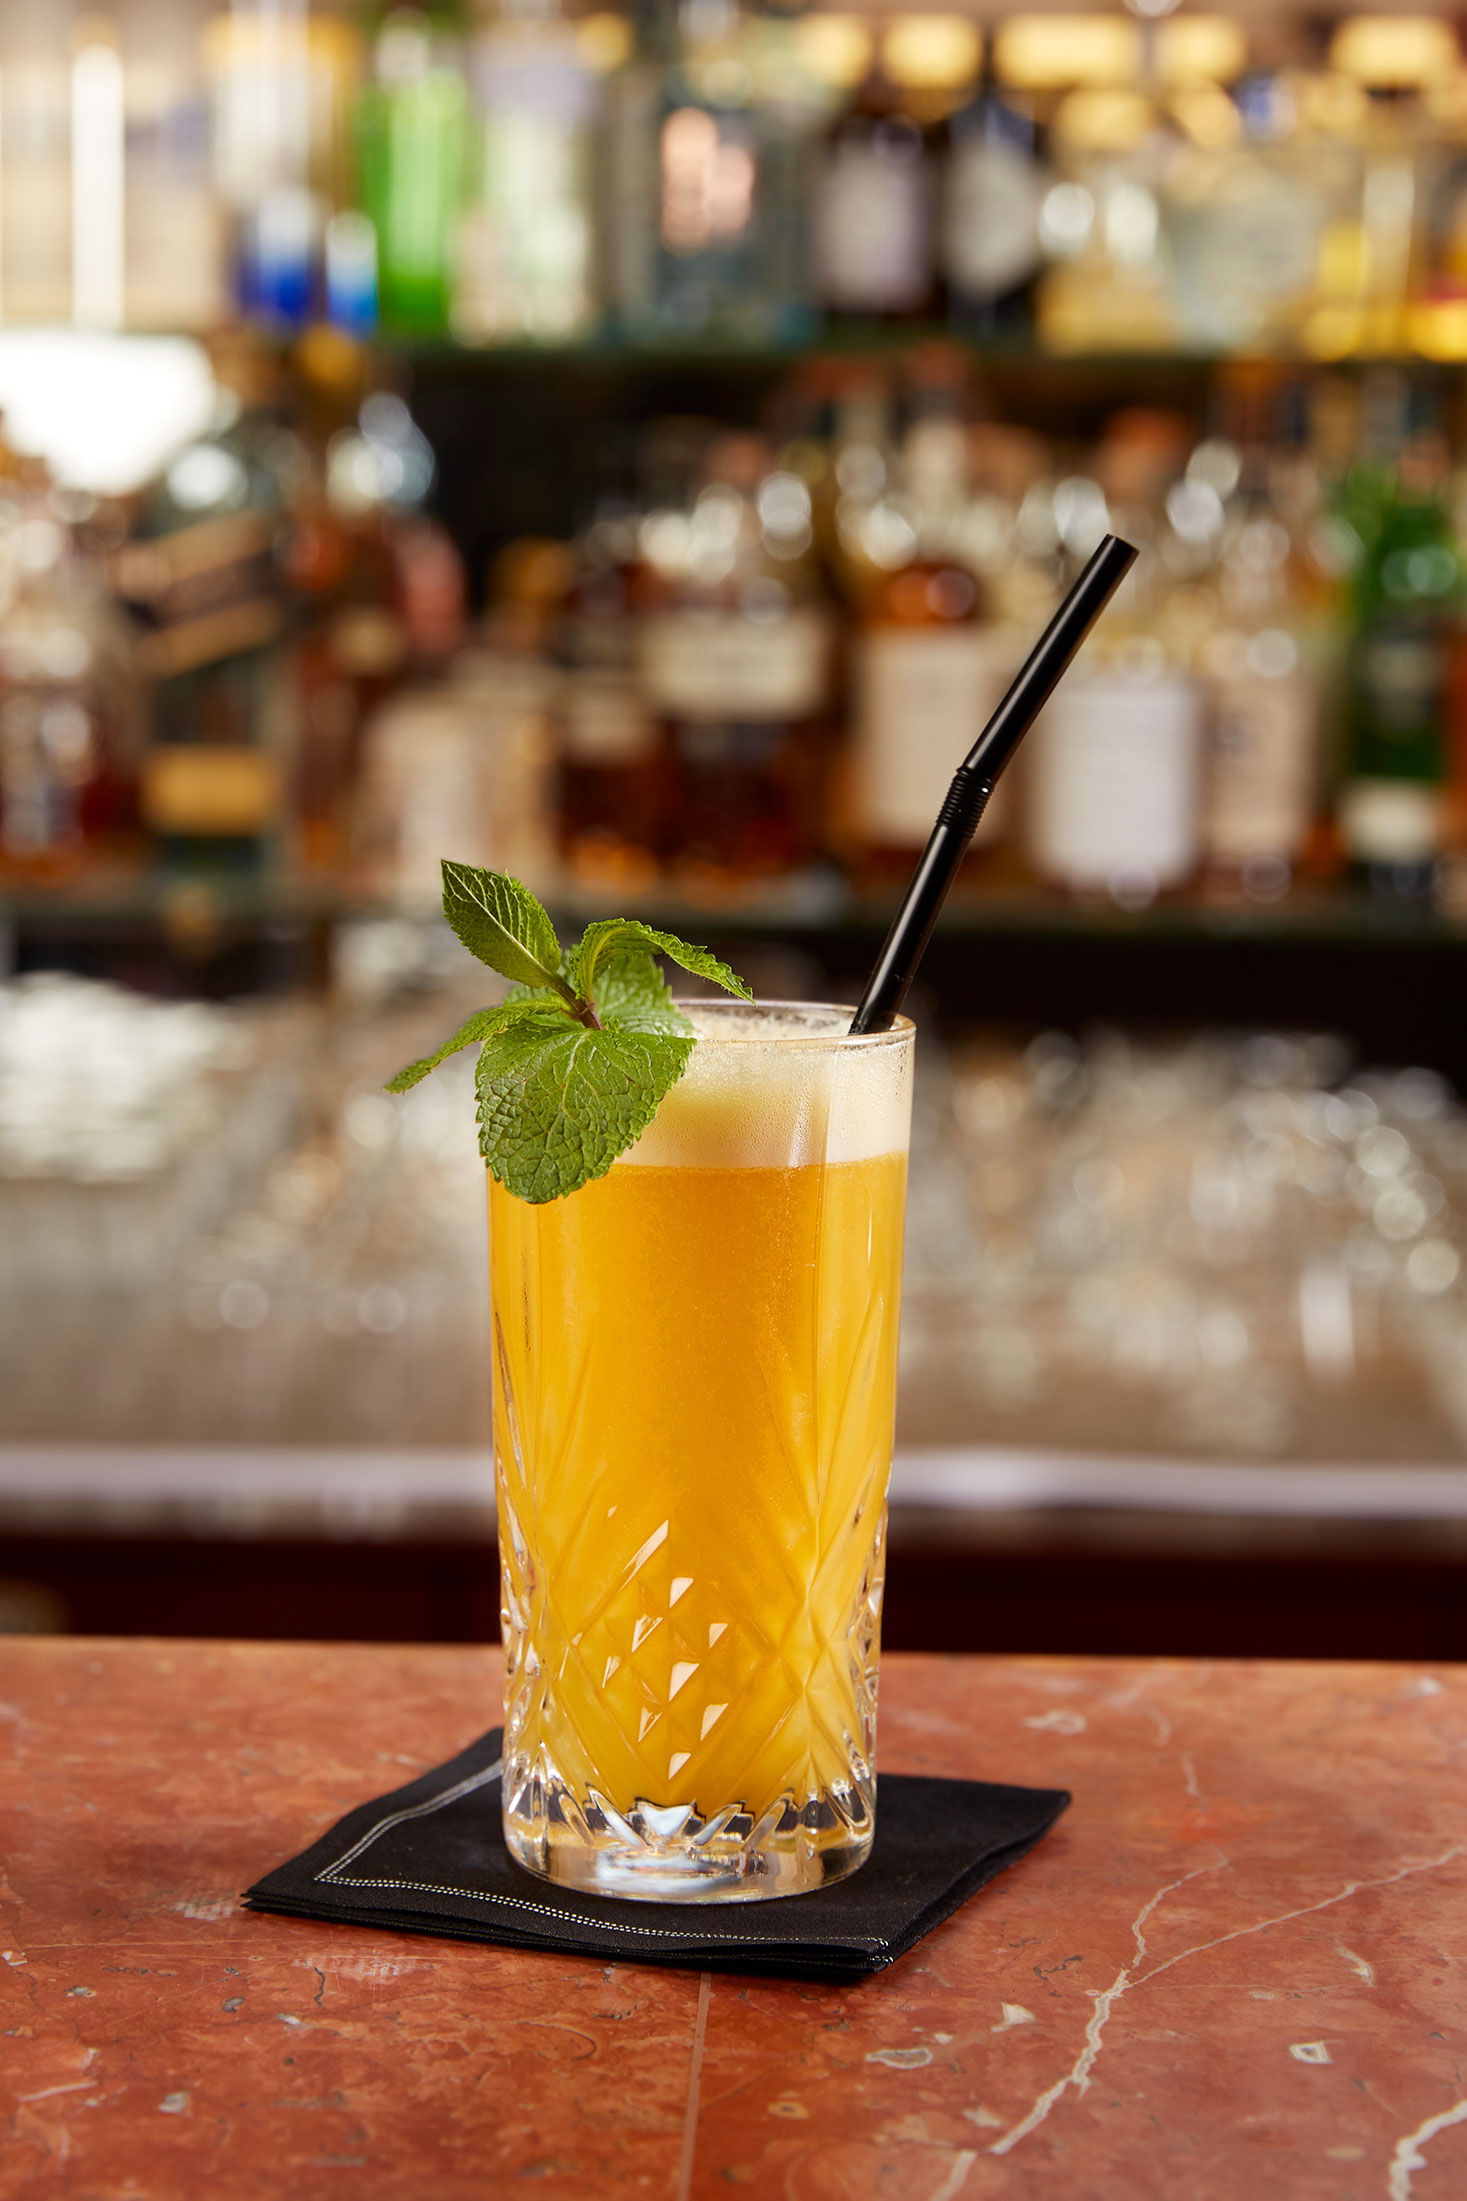 Albertine's bar cocktails